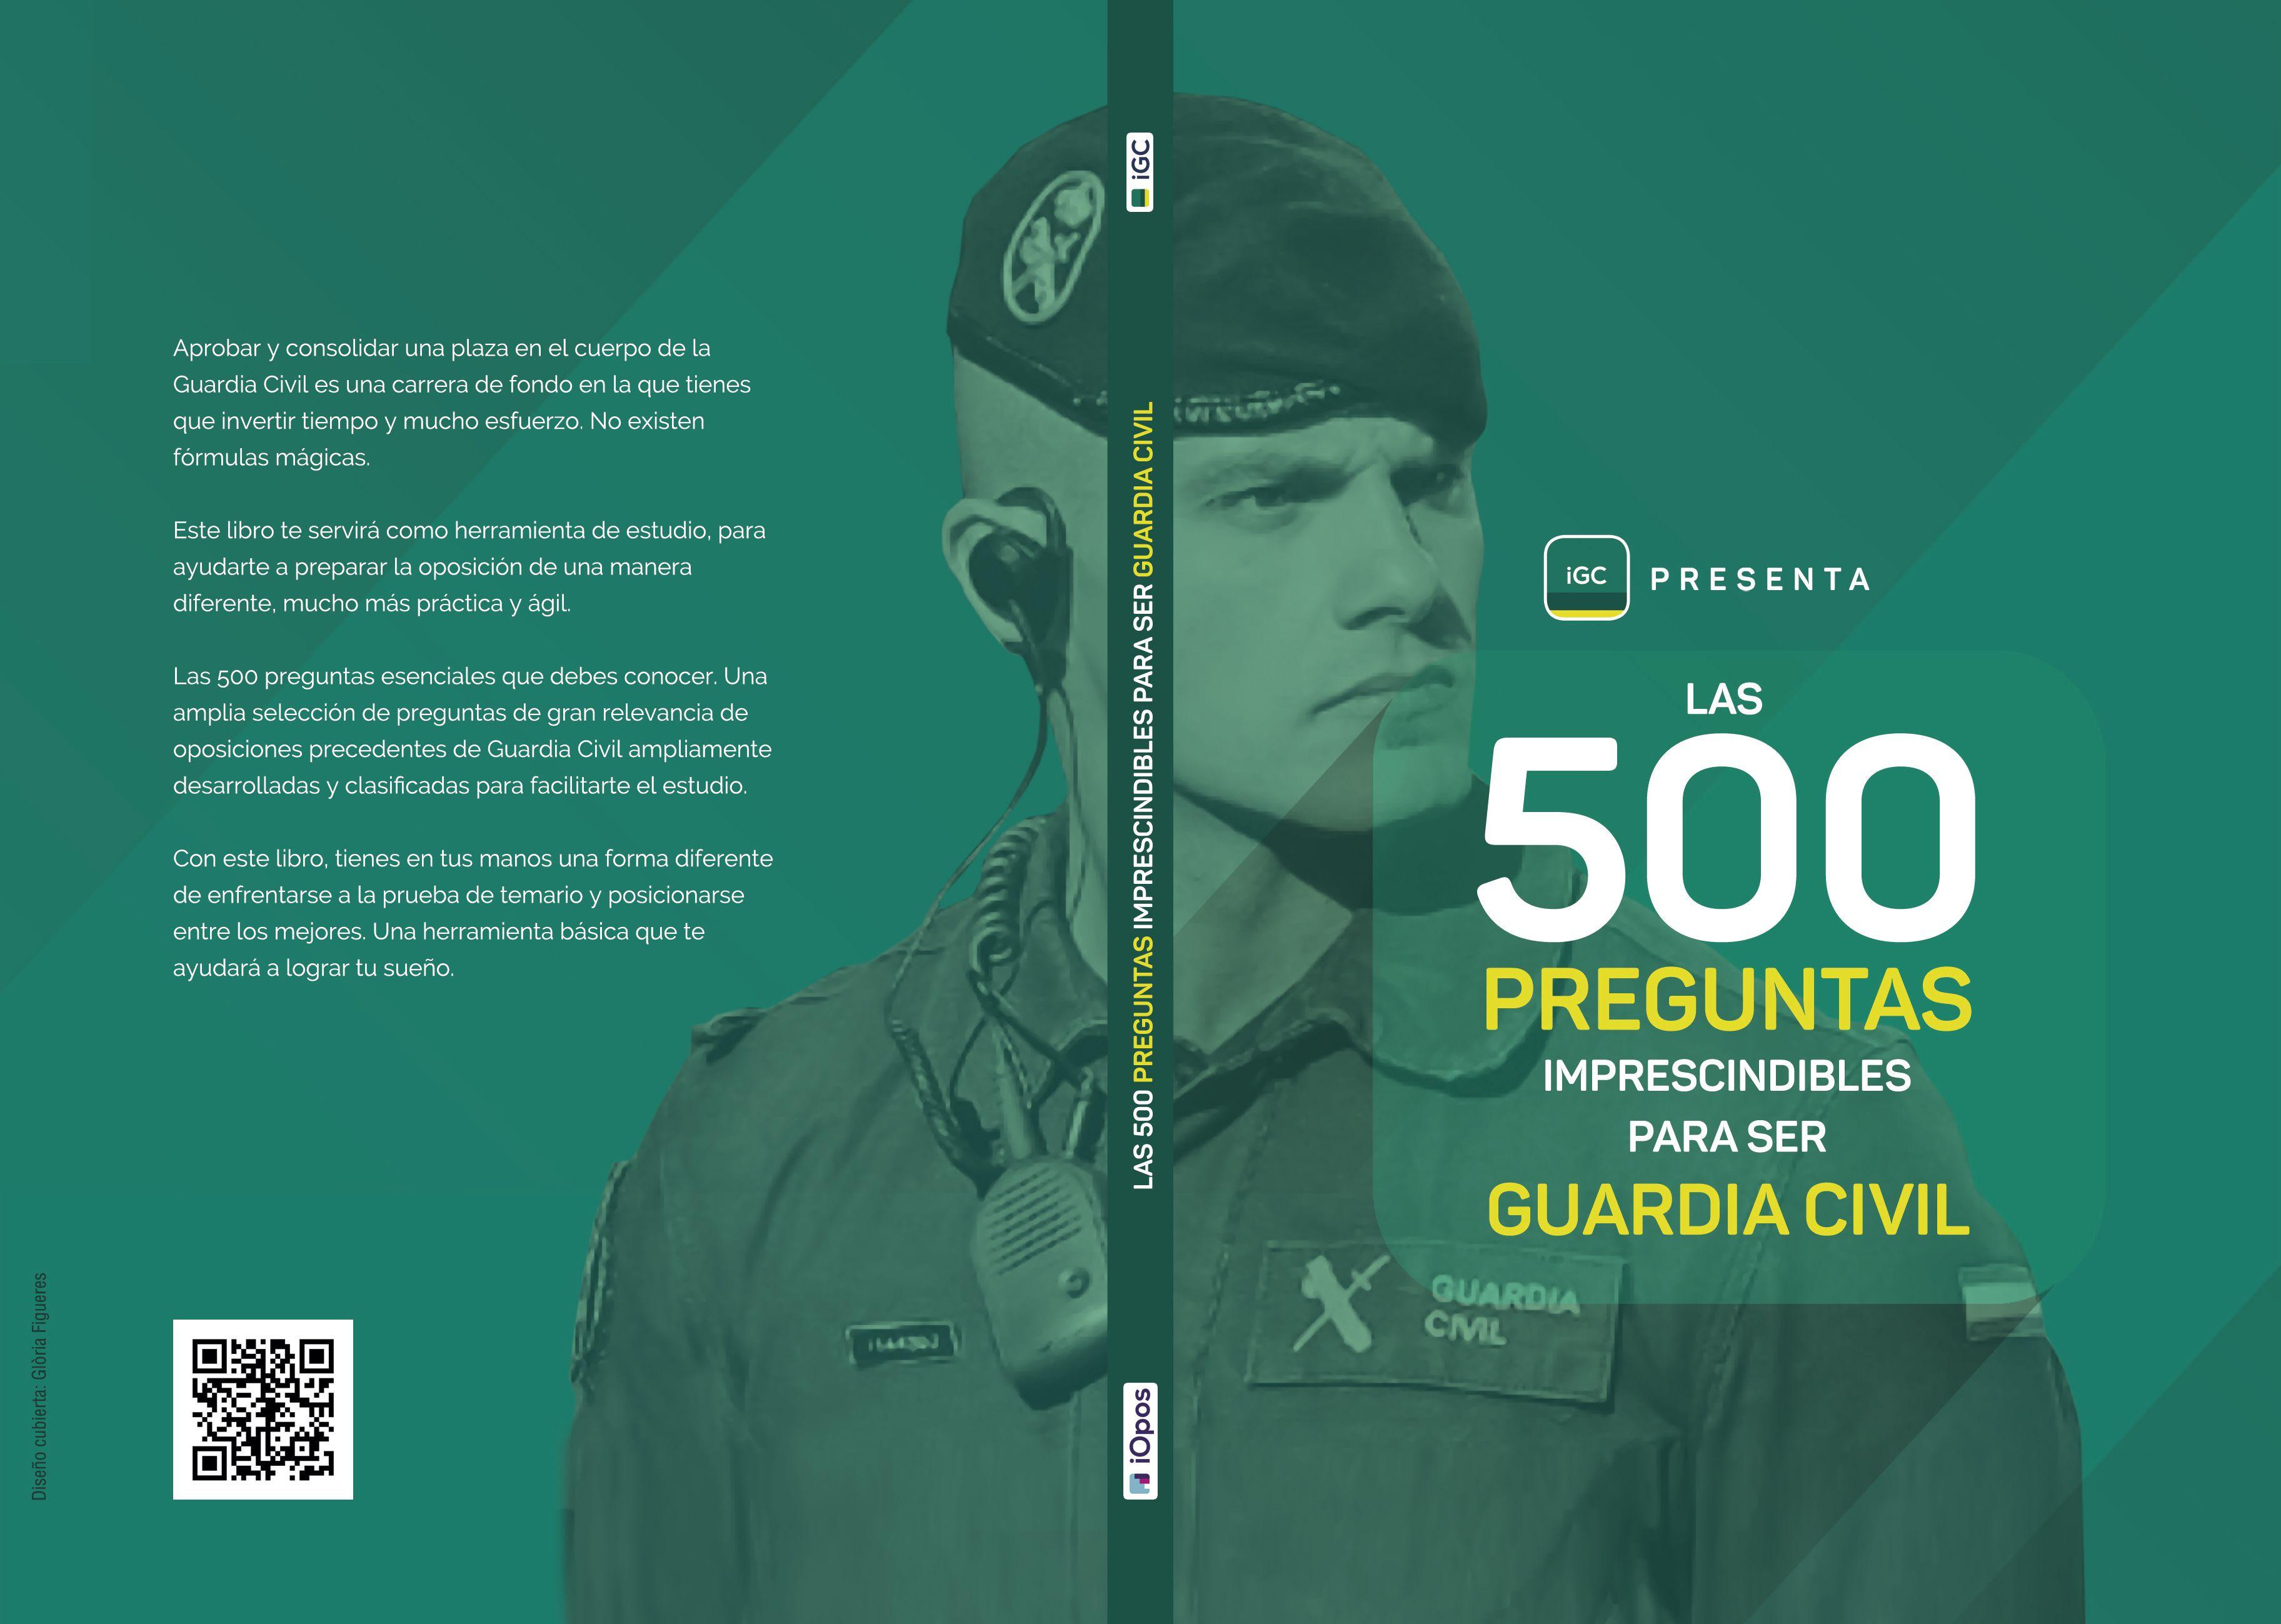 Las 500 preguntas imprescindibles para ser Guardia Civil